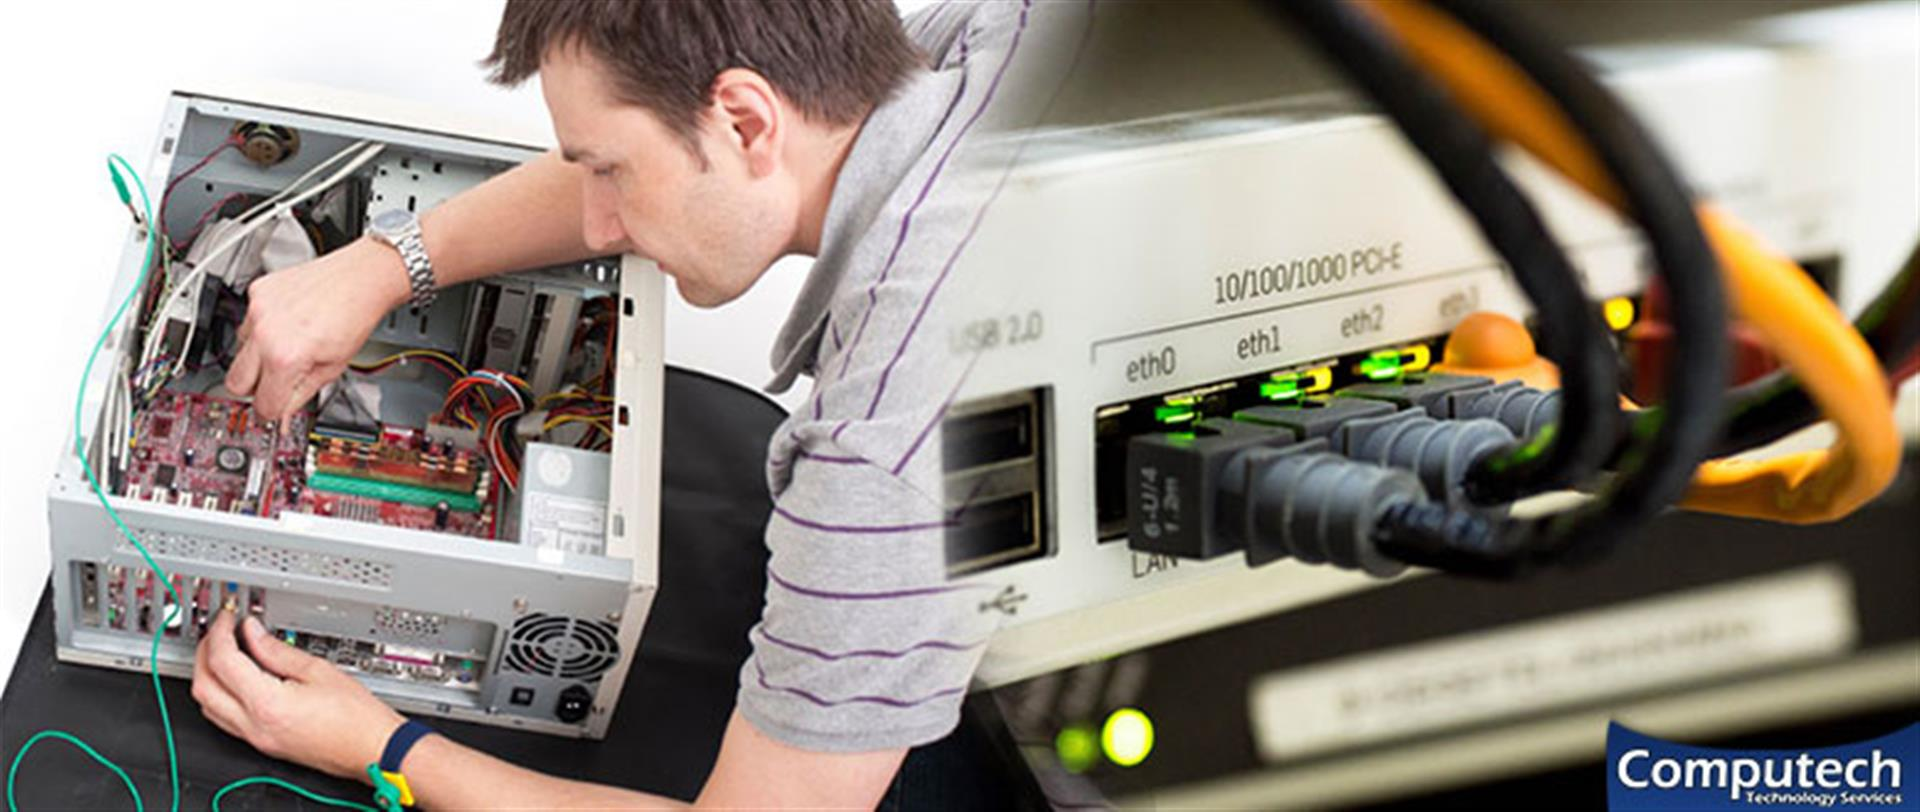 Emporia Virginia Onsite Computer PC & Printer Repair, Networks, Voice & Data Cabling Services